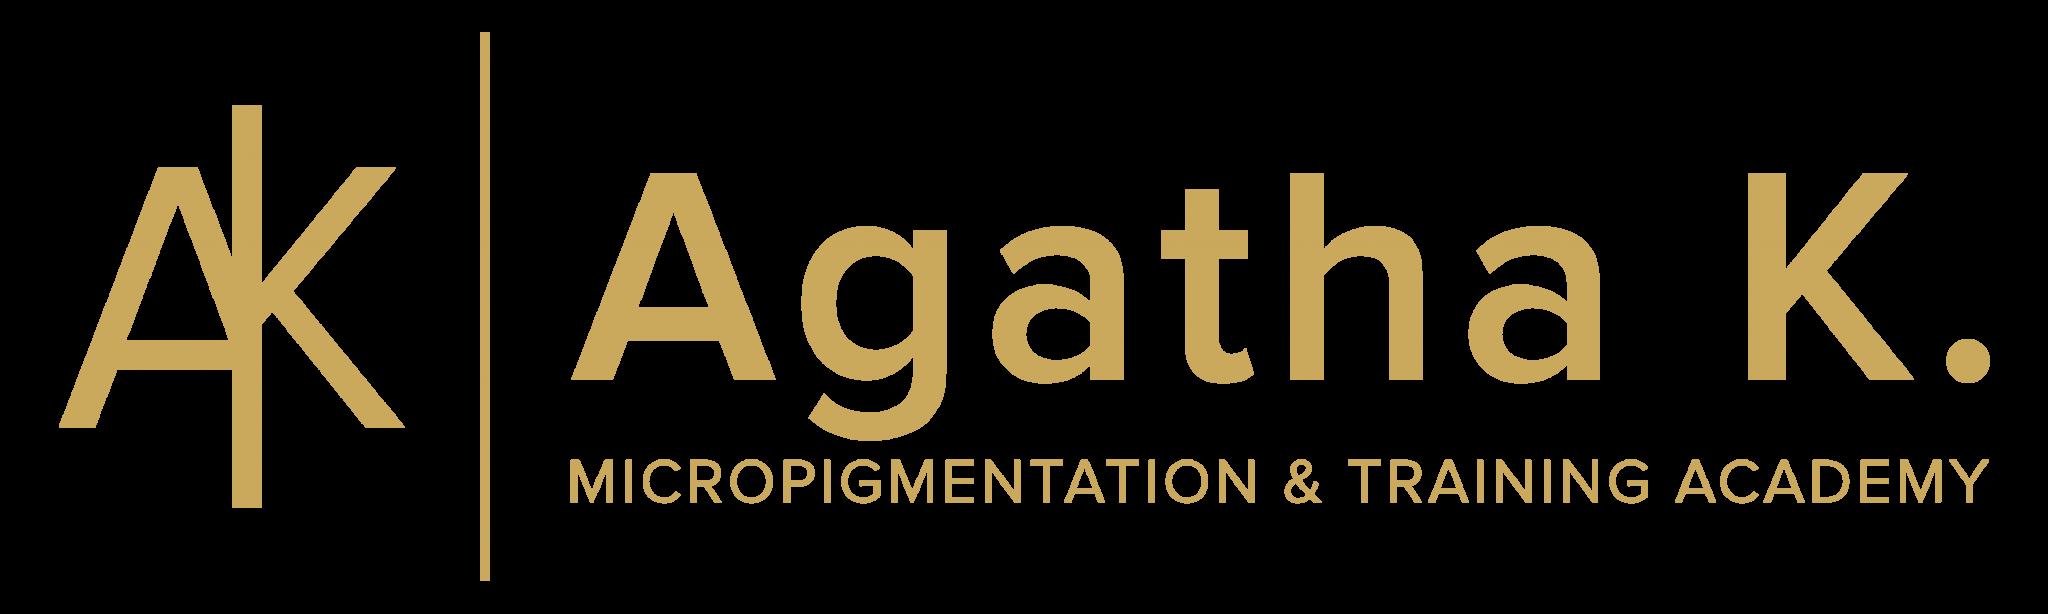 Agatha K Micropigmentation